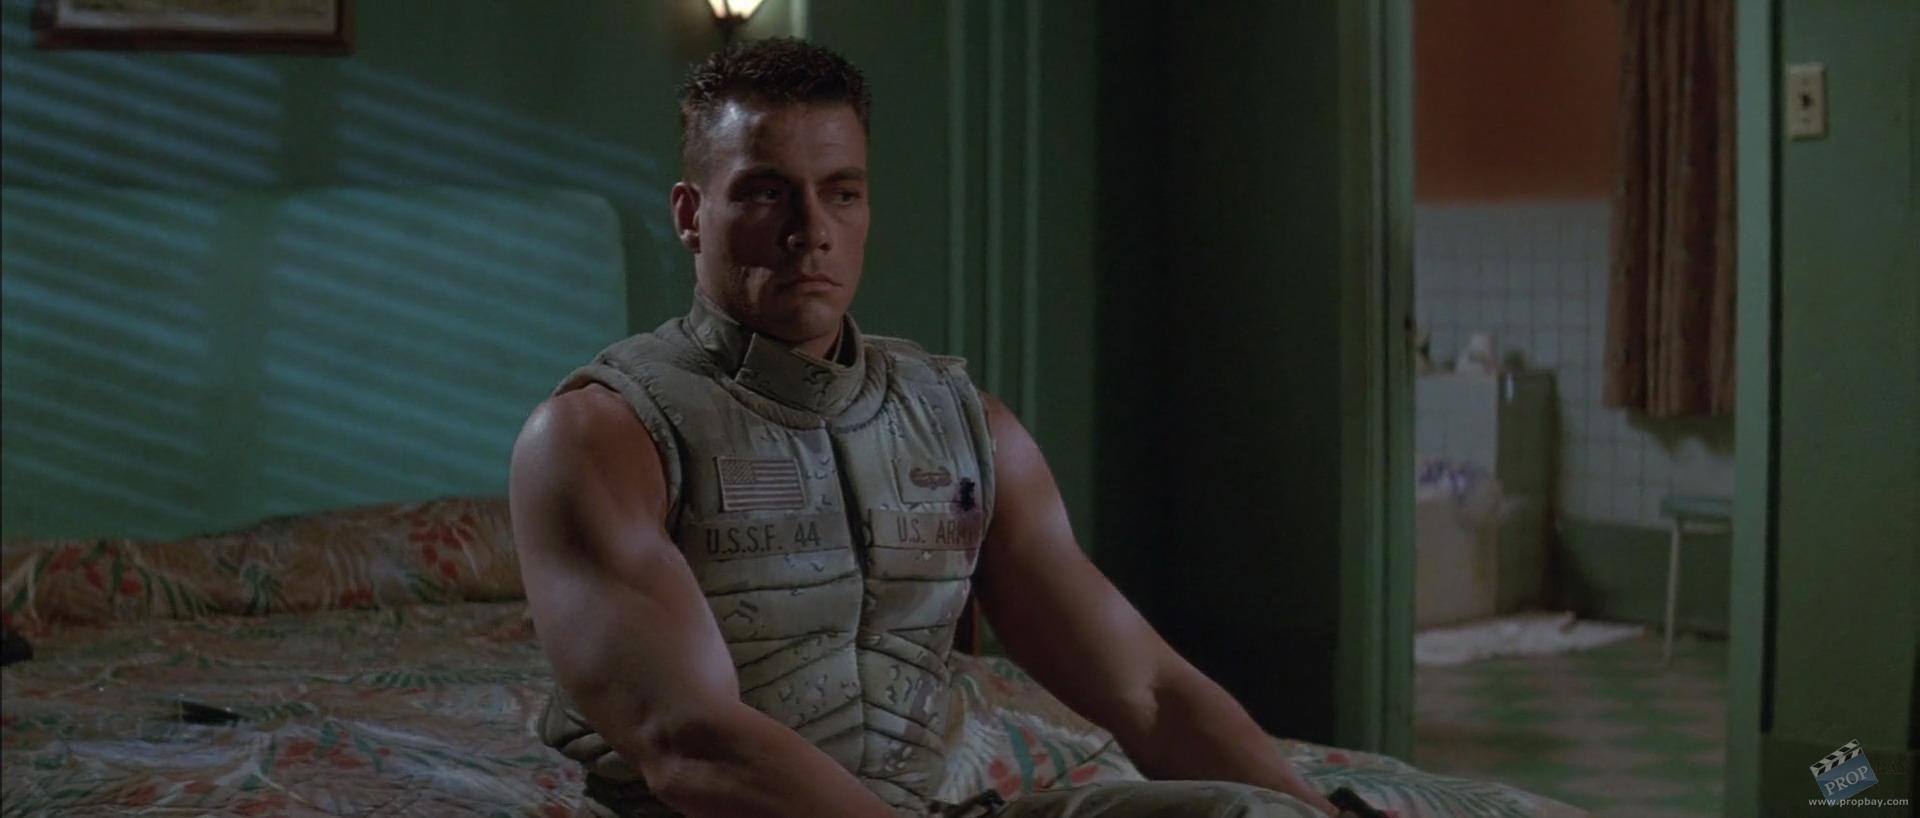 Luc Deveraux - GR44 (Jean-Claude Van Damme) Vest Wardrobe ...